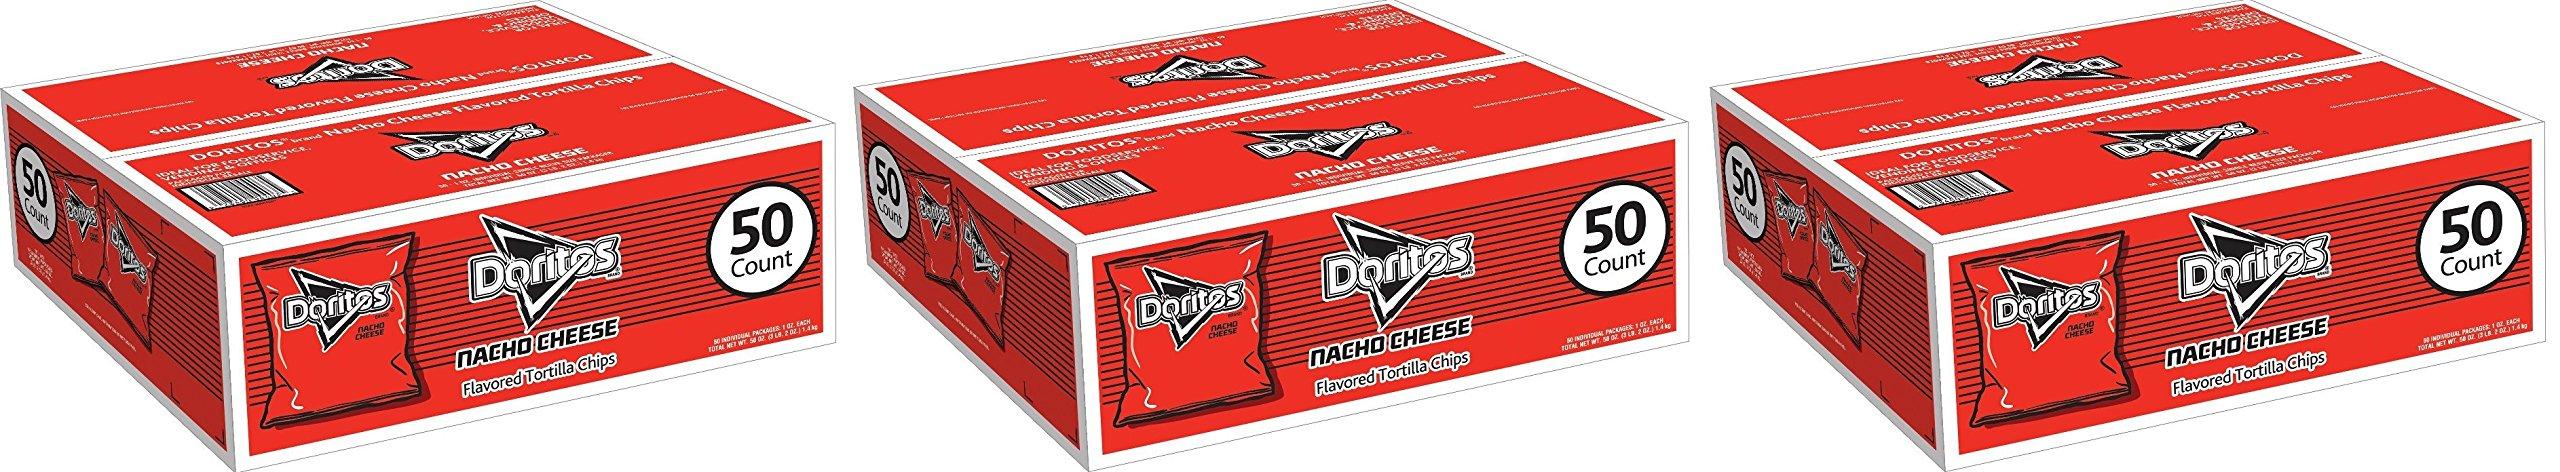 Doritos Tortilla uDJmpQ Chips, Nacho Cheese, 1 Oz Bags, 50 Count, 3 Pack